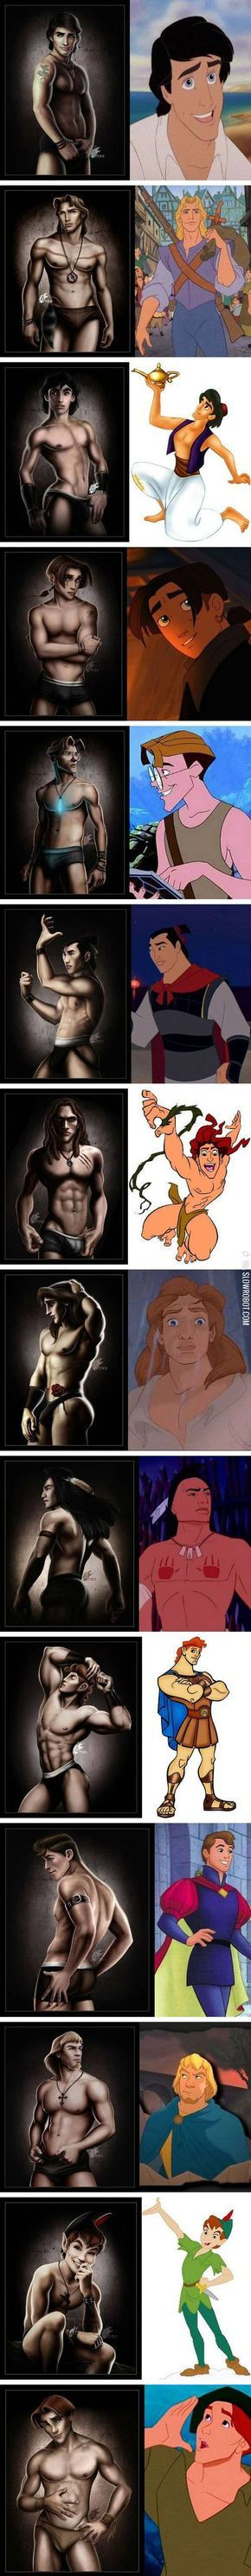 If Disney princes were underwear models. Interesting take on Disney male icons.